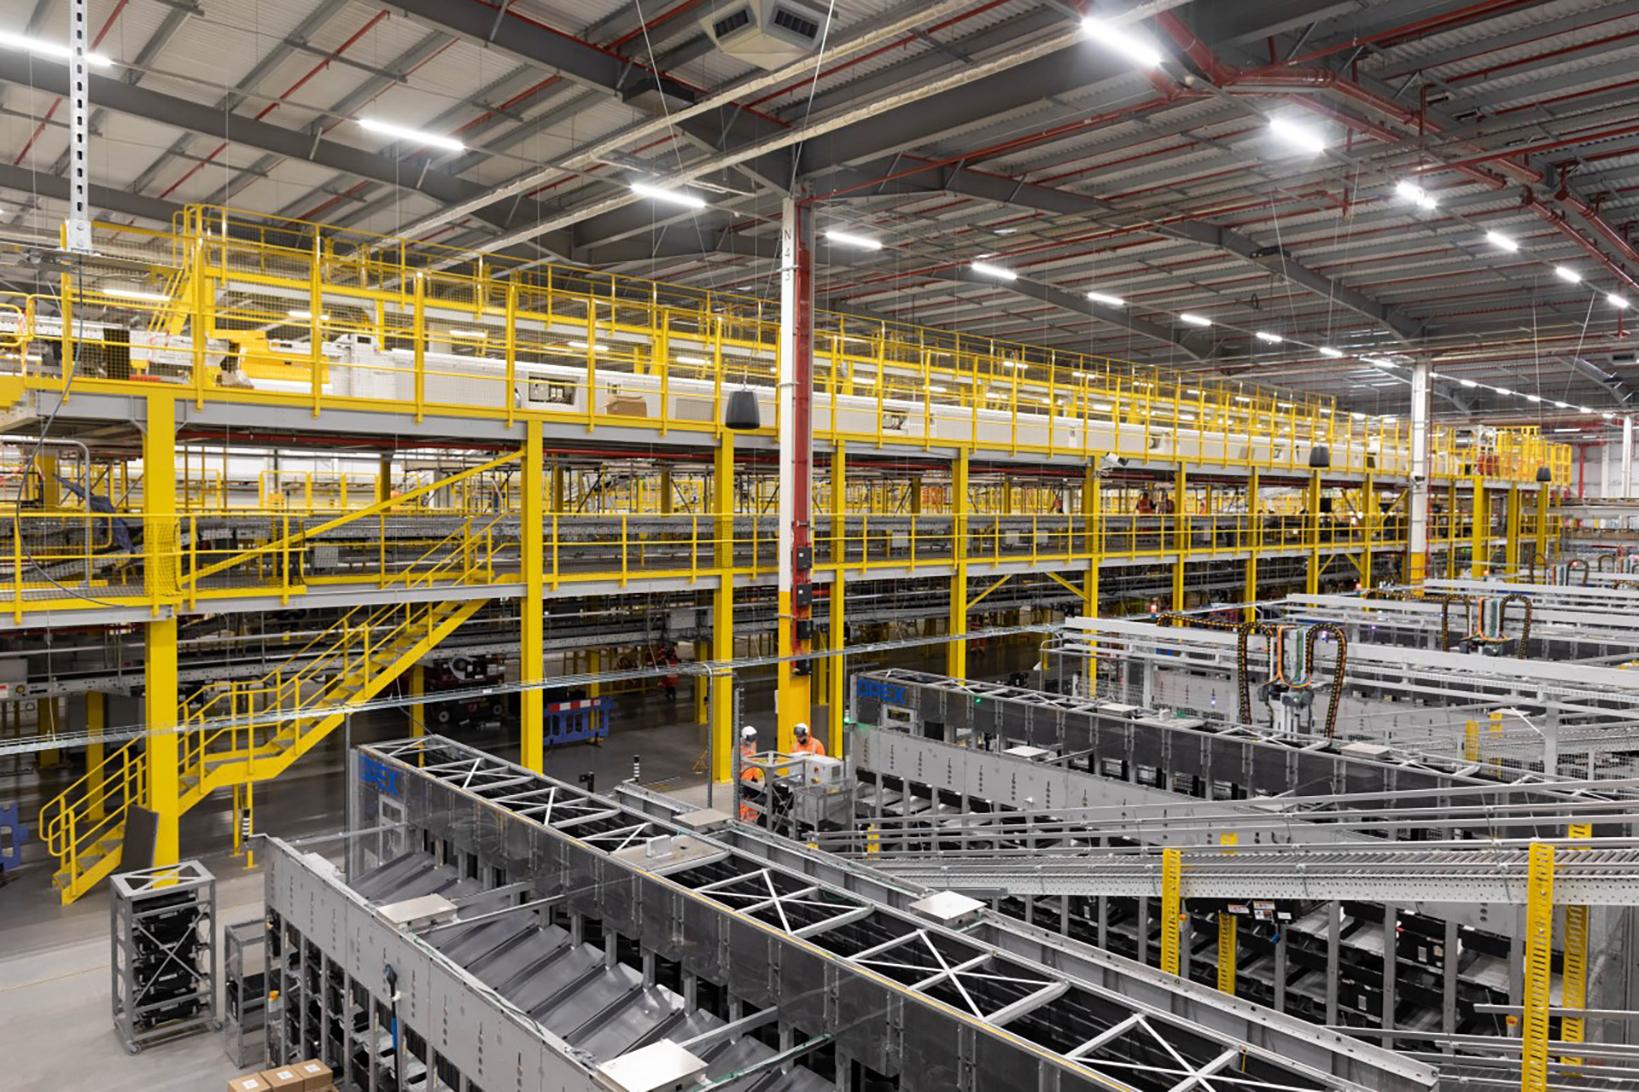 Mezzanine Systems Press Release by MiTek - View of a mezzanine system in a warehouse